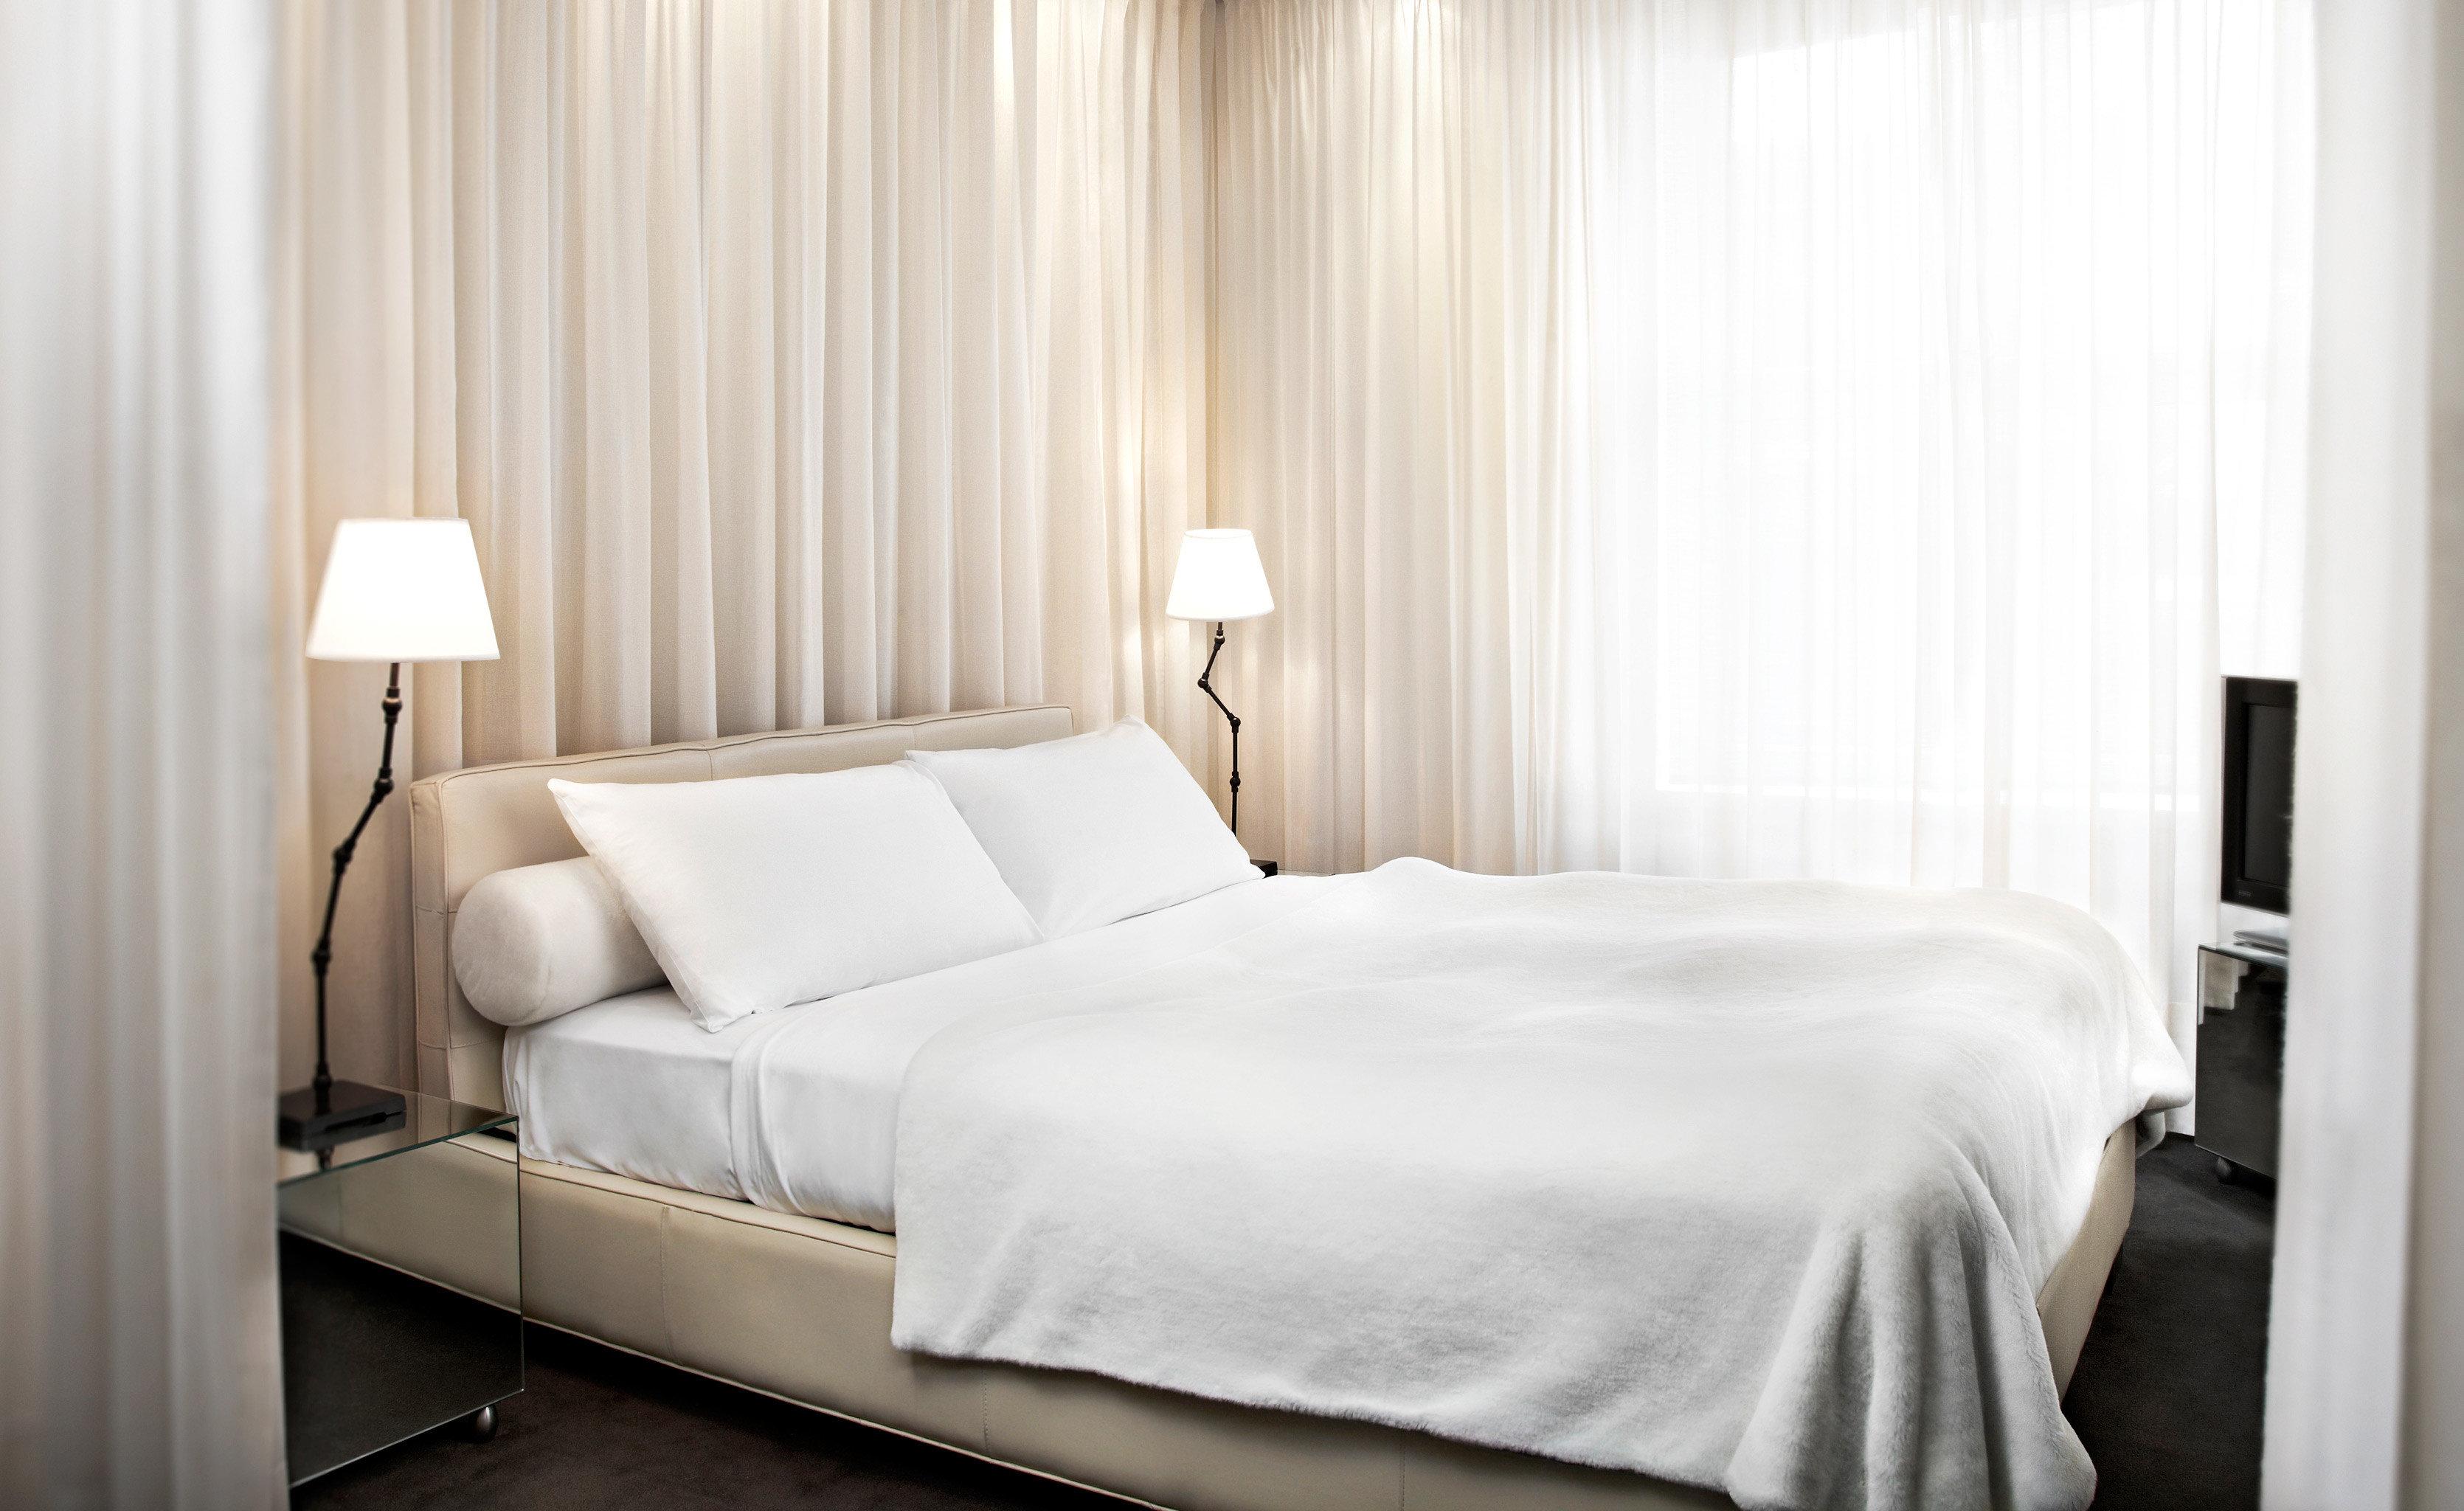 Bedroom Elegant Historic Modern curtain property white Suite cottage bed sheet